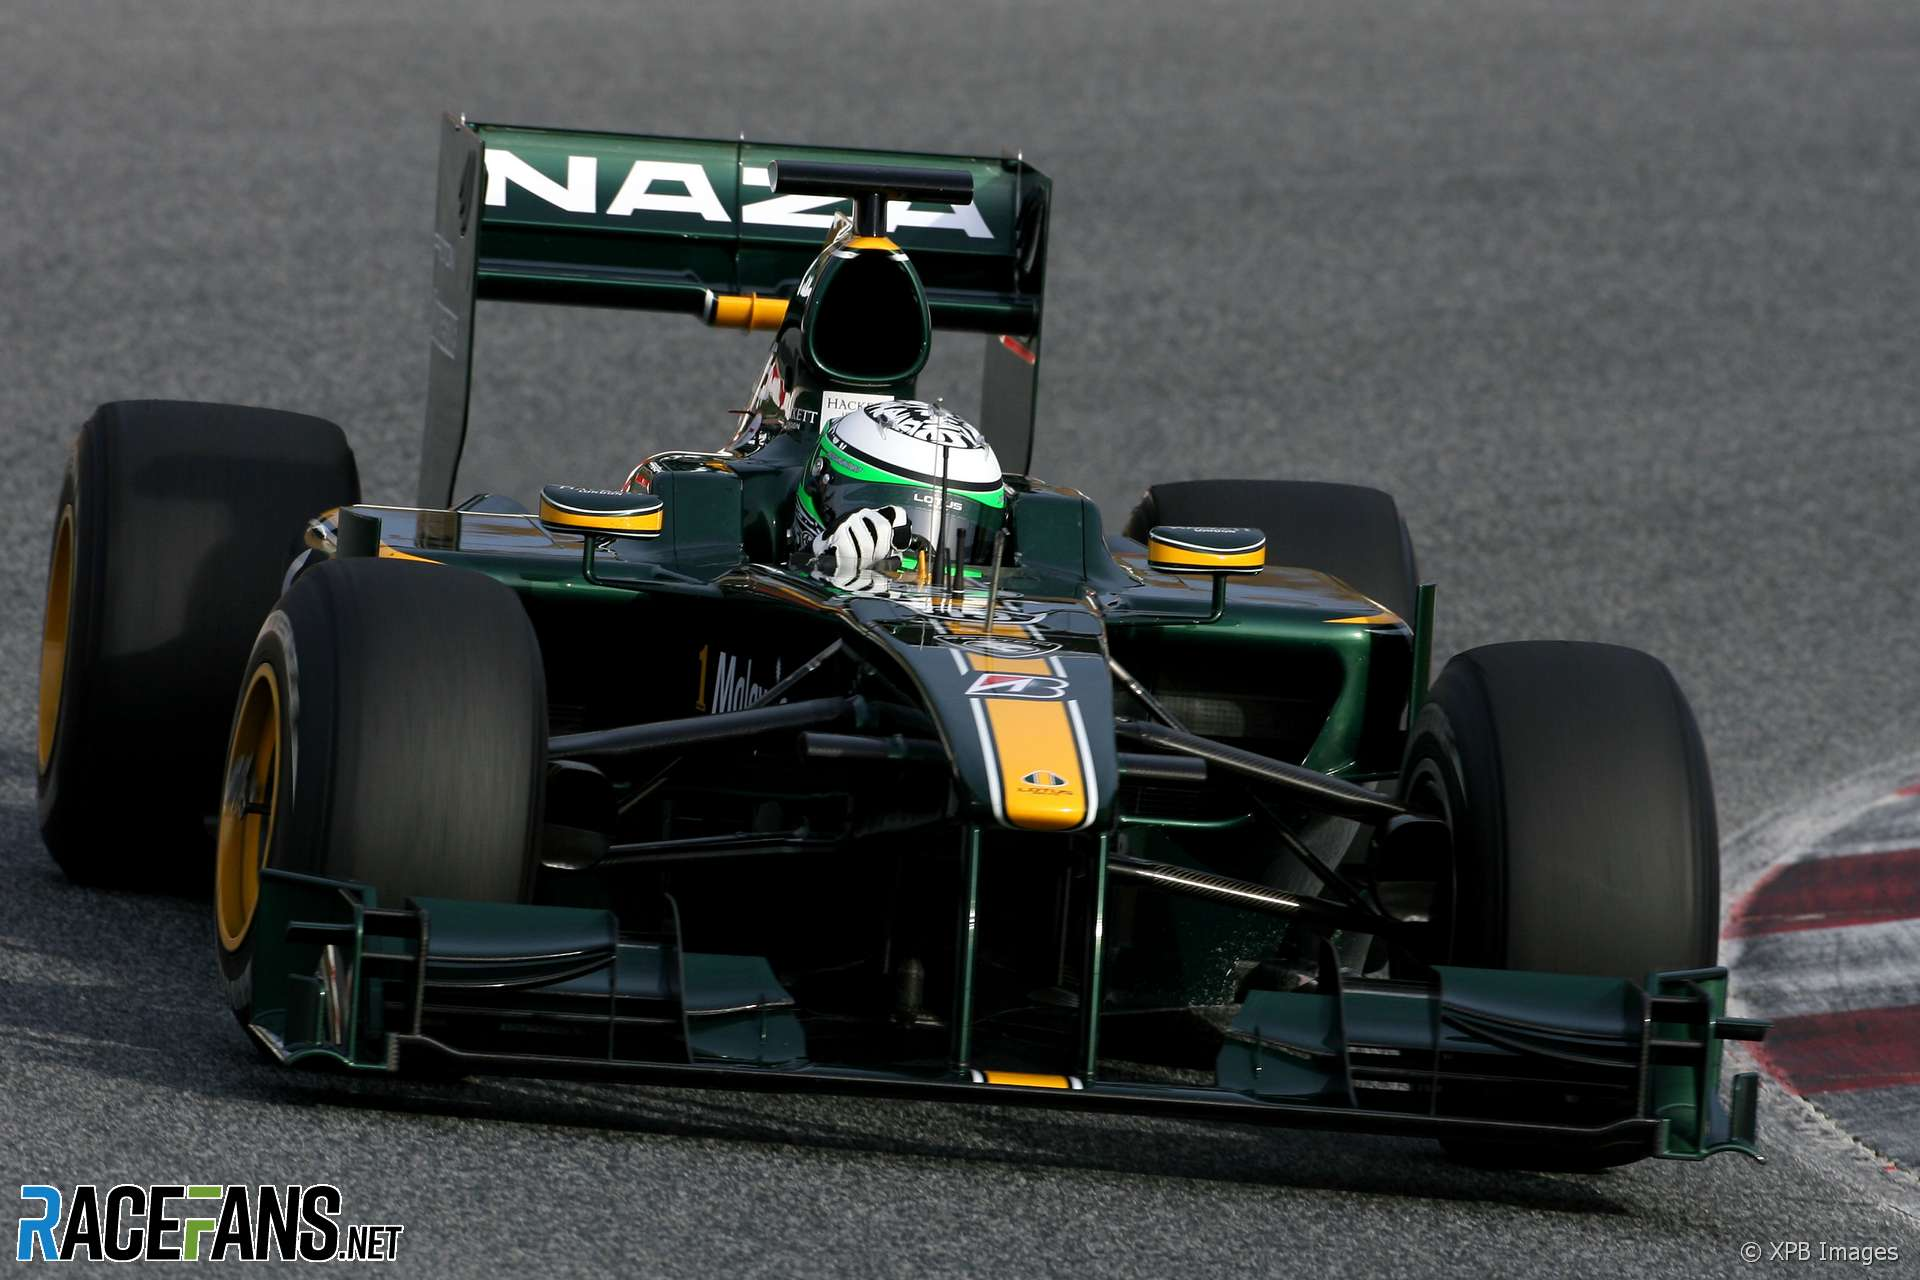 Heikki Kovalainen, Lotus, Circuit de Catalunya, 2010